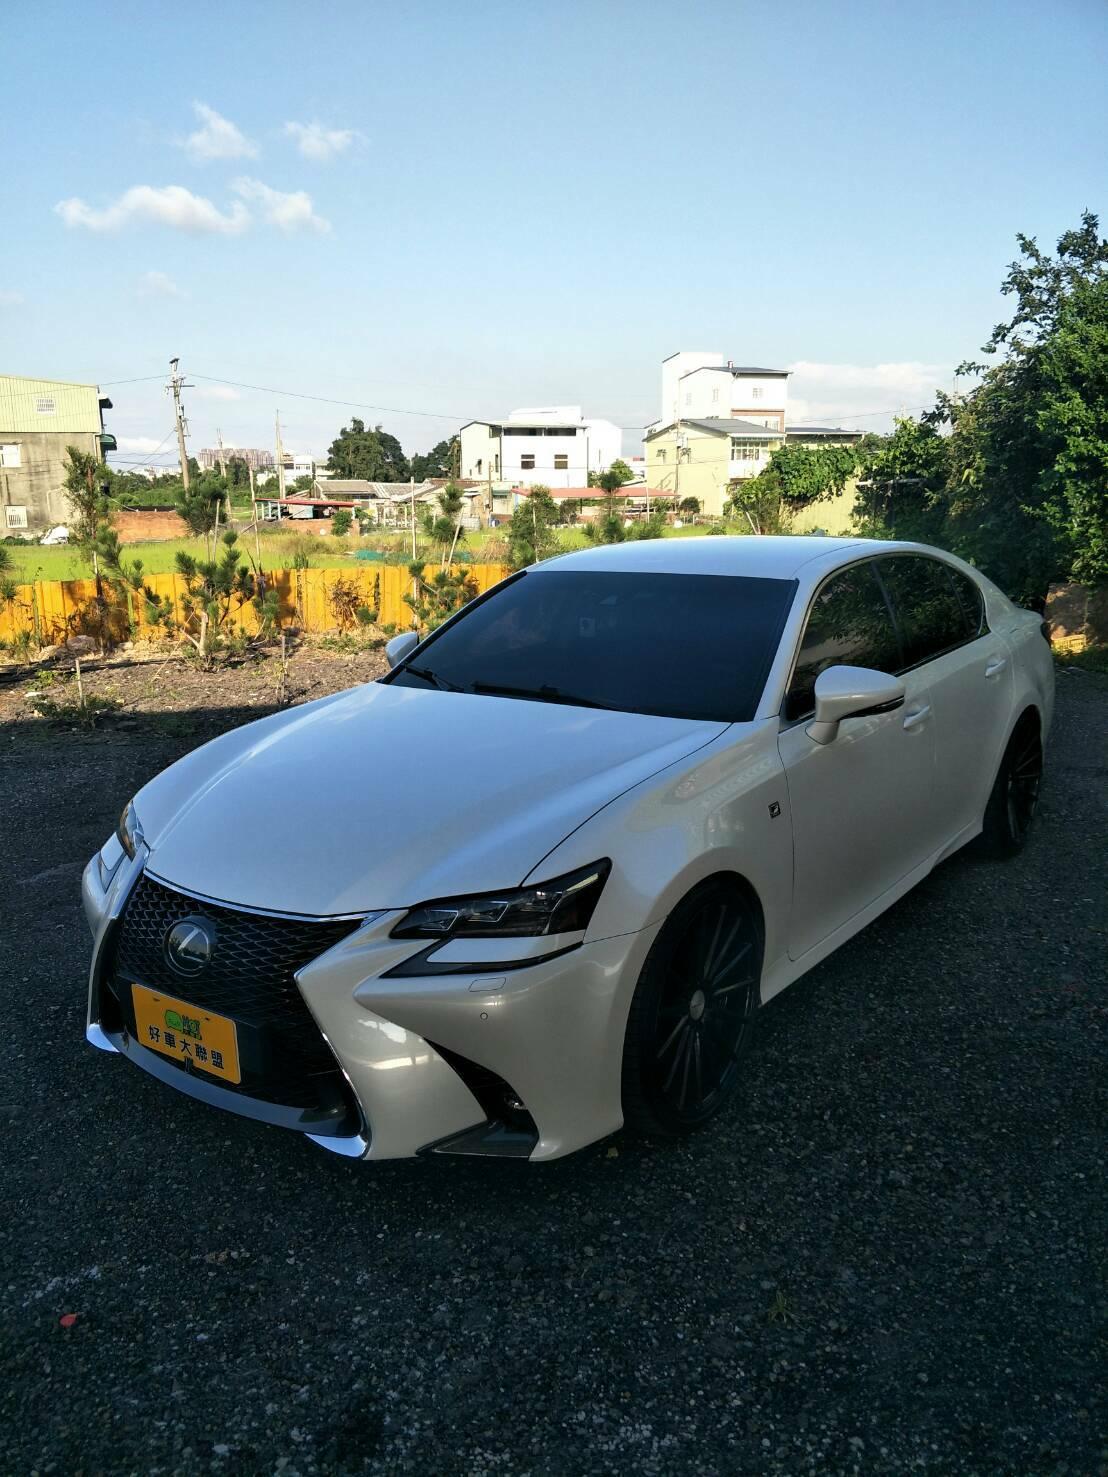 2017 Lexus 凌志 Gs